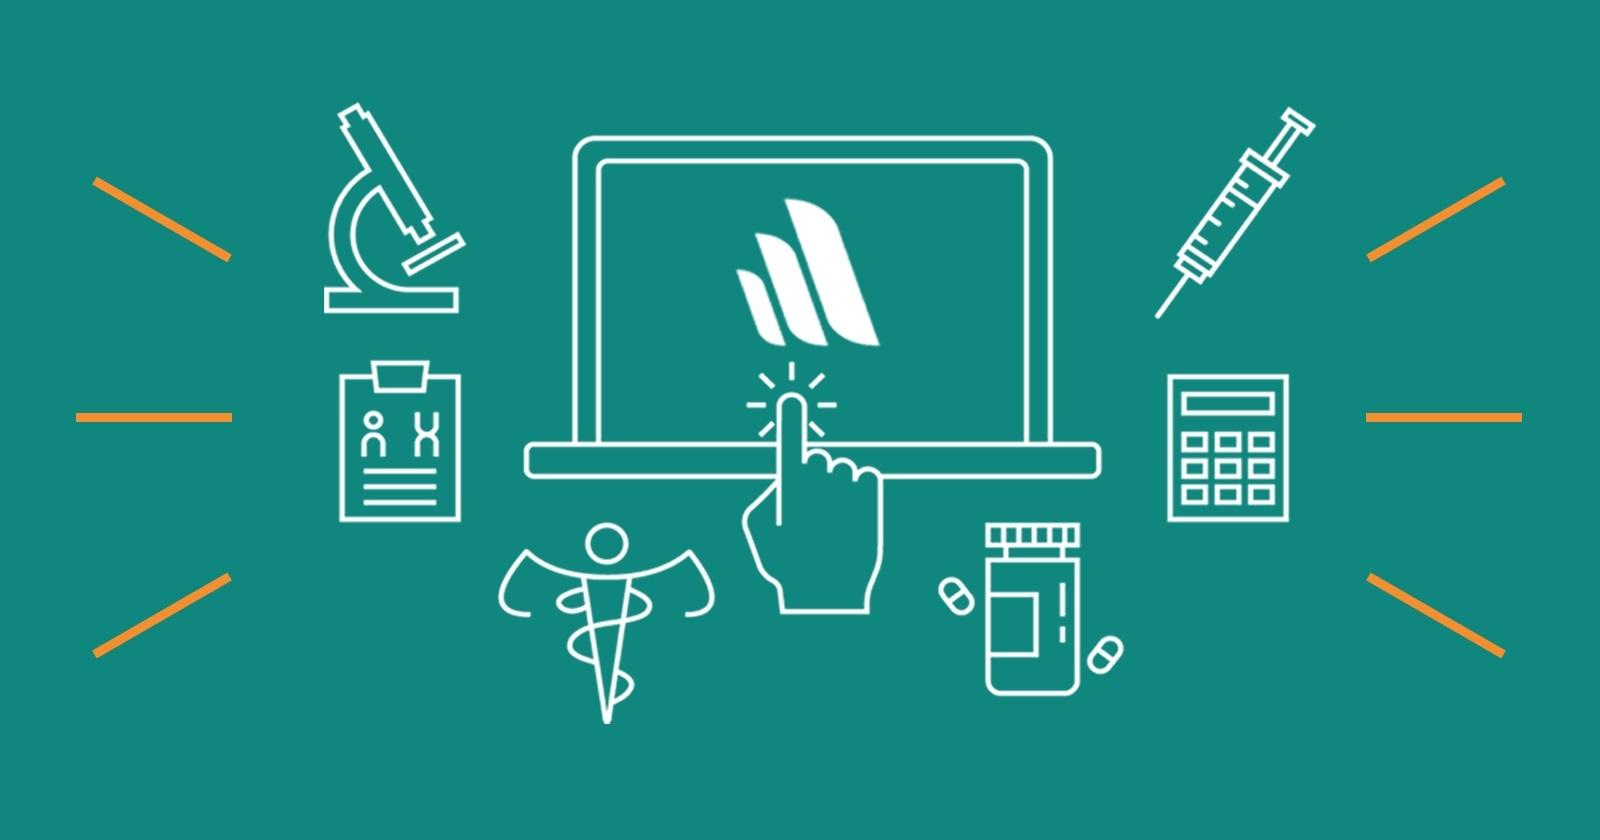 www.merckvetmanual.com